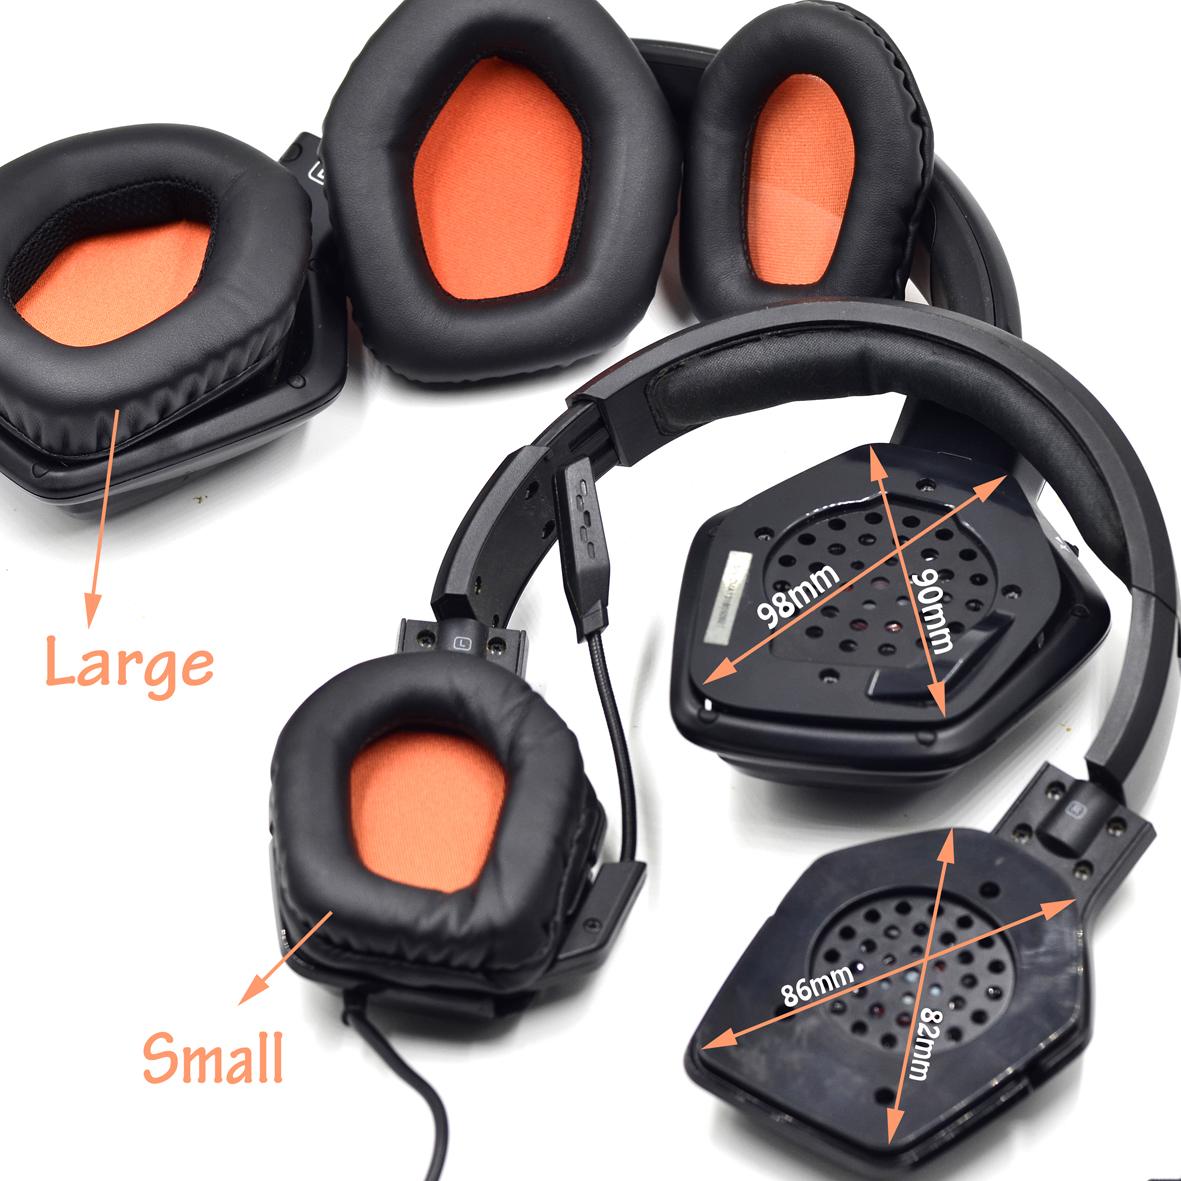 Defean Replacement Ear Pads Cushion For Tritton Warhead 7 1 Dolby Katana Detonator Xbox 360 Headphones Earphone Accessories Aliexpress